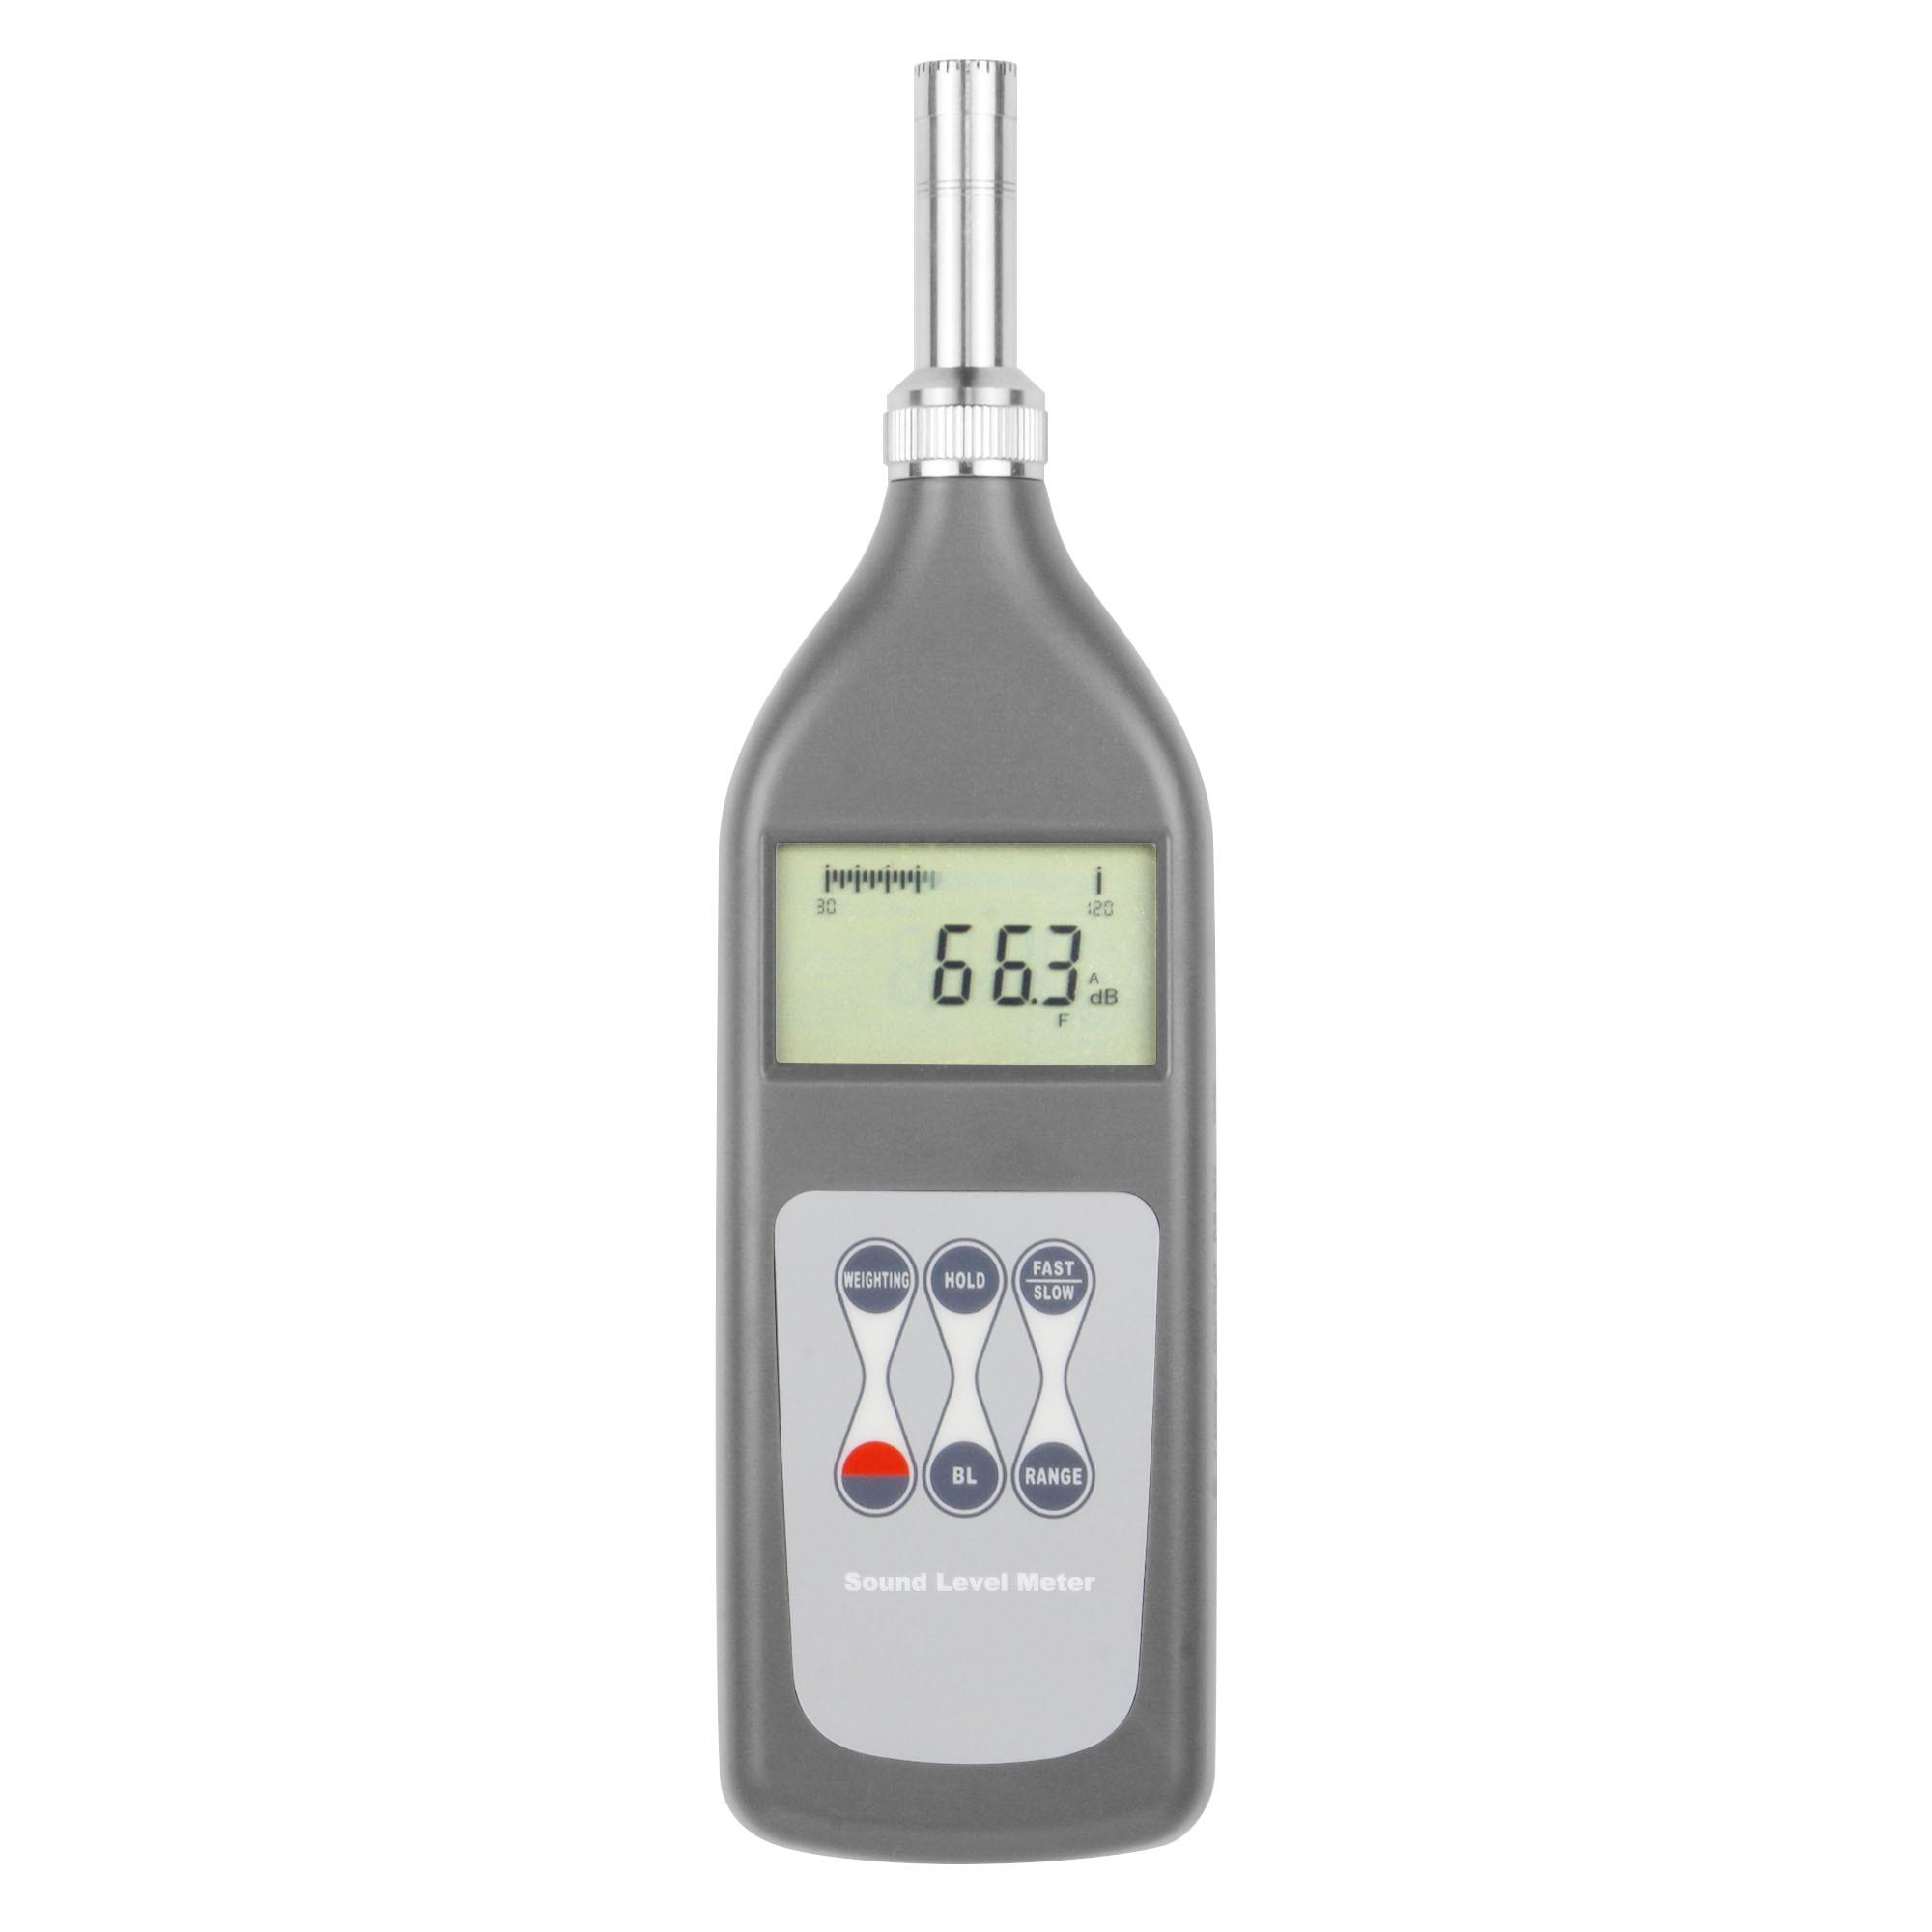 LANDTEK High-precision Accurate for laboratory Sound Level Meter SL-5868N Range 25dB~130dB (A)